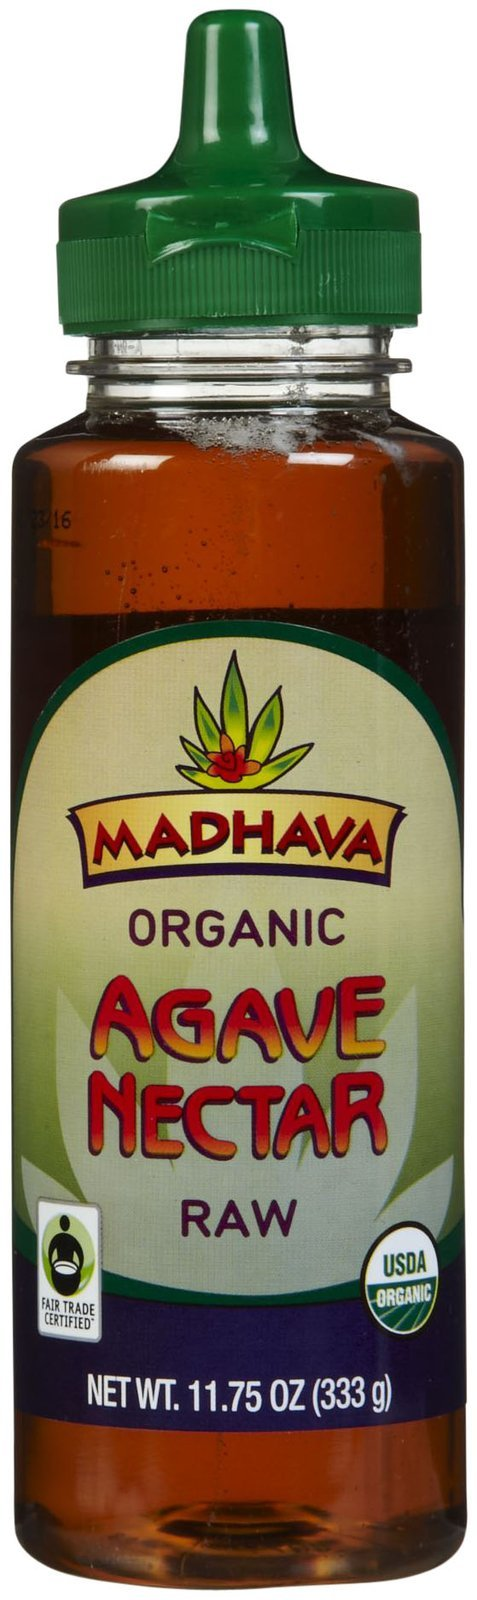 Madhava Organic Agave Nectar Raw - 11.75 oz